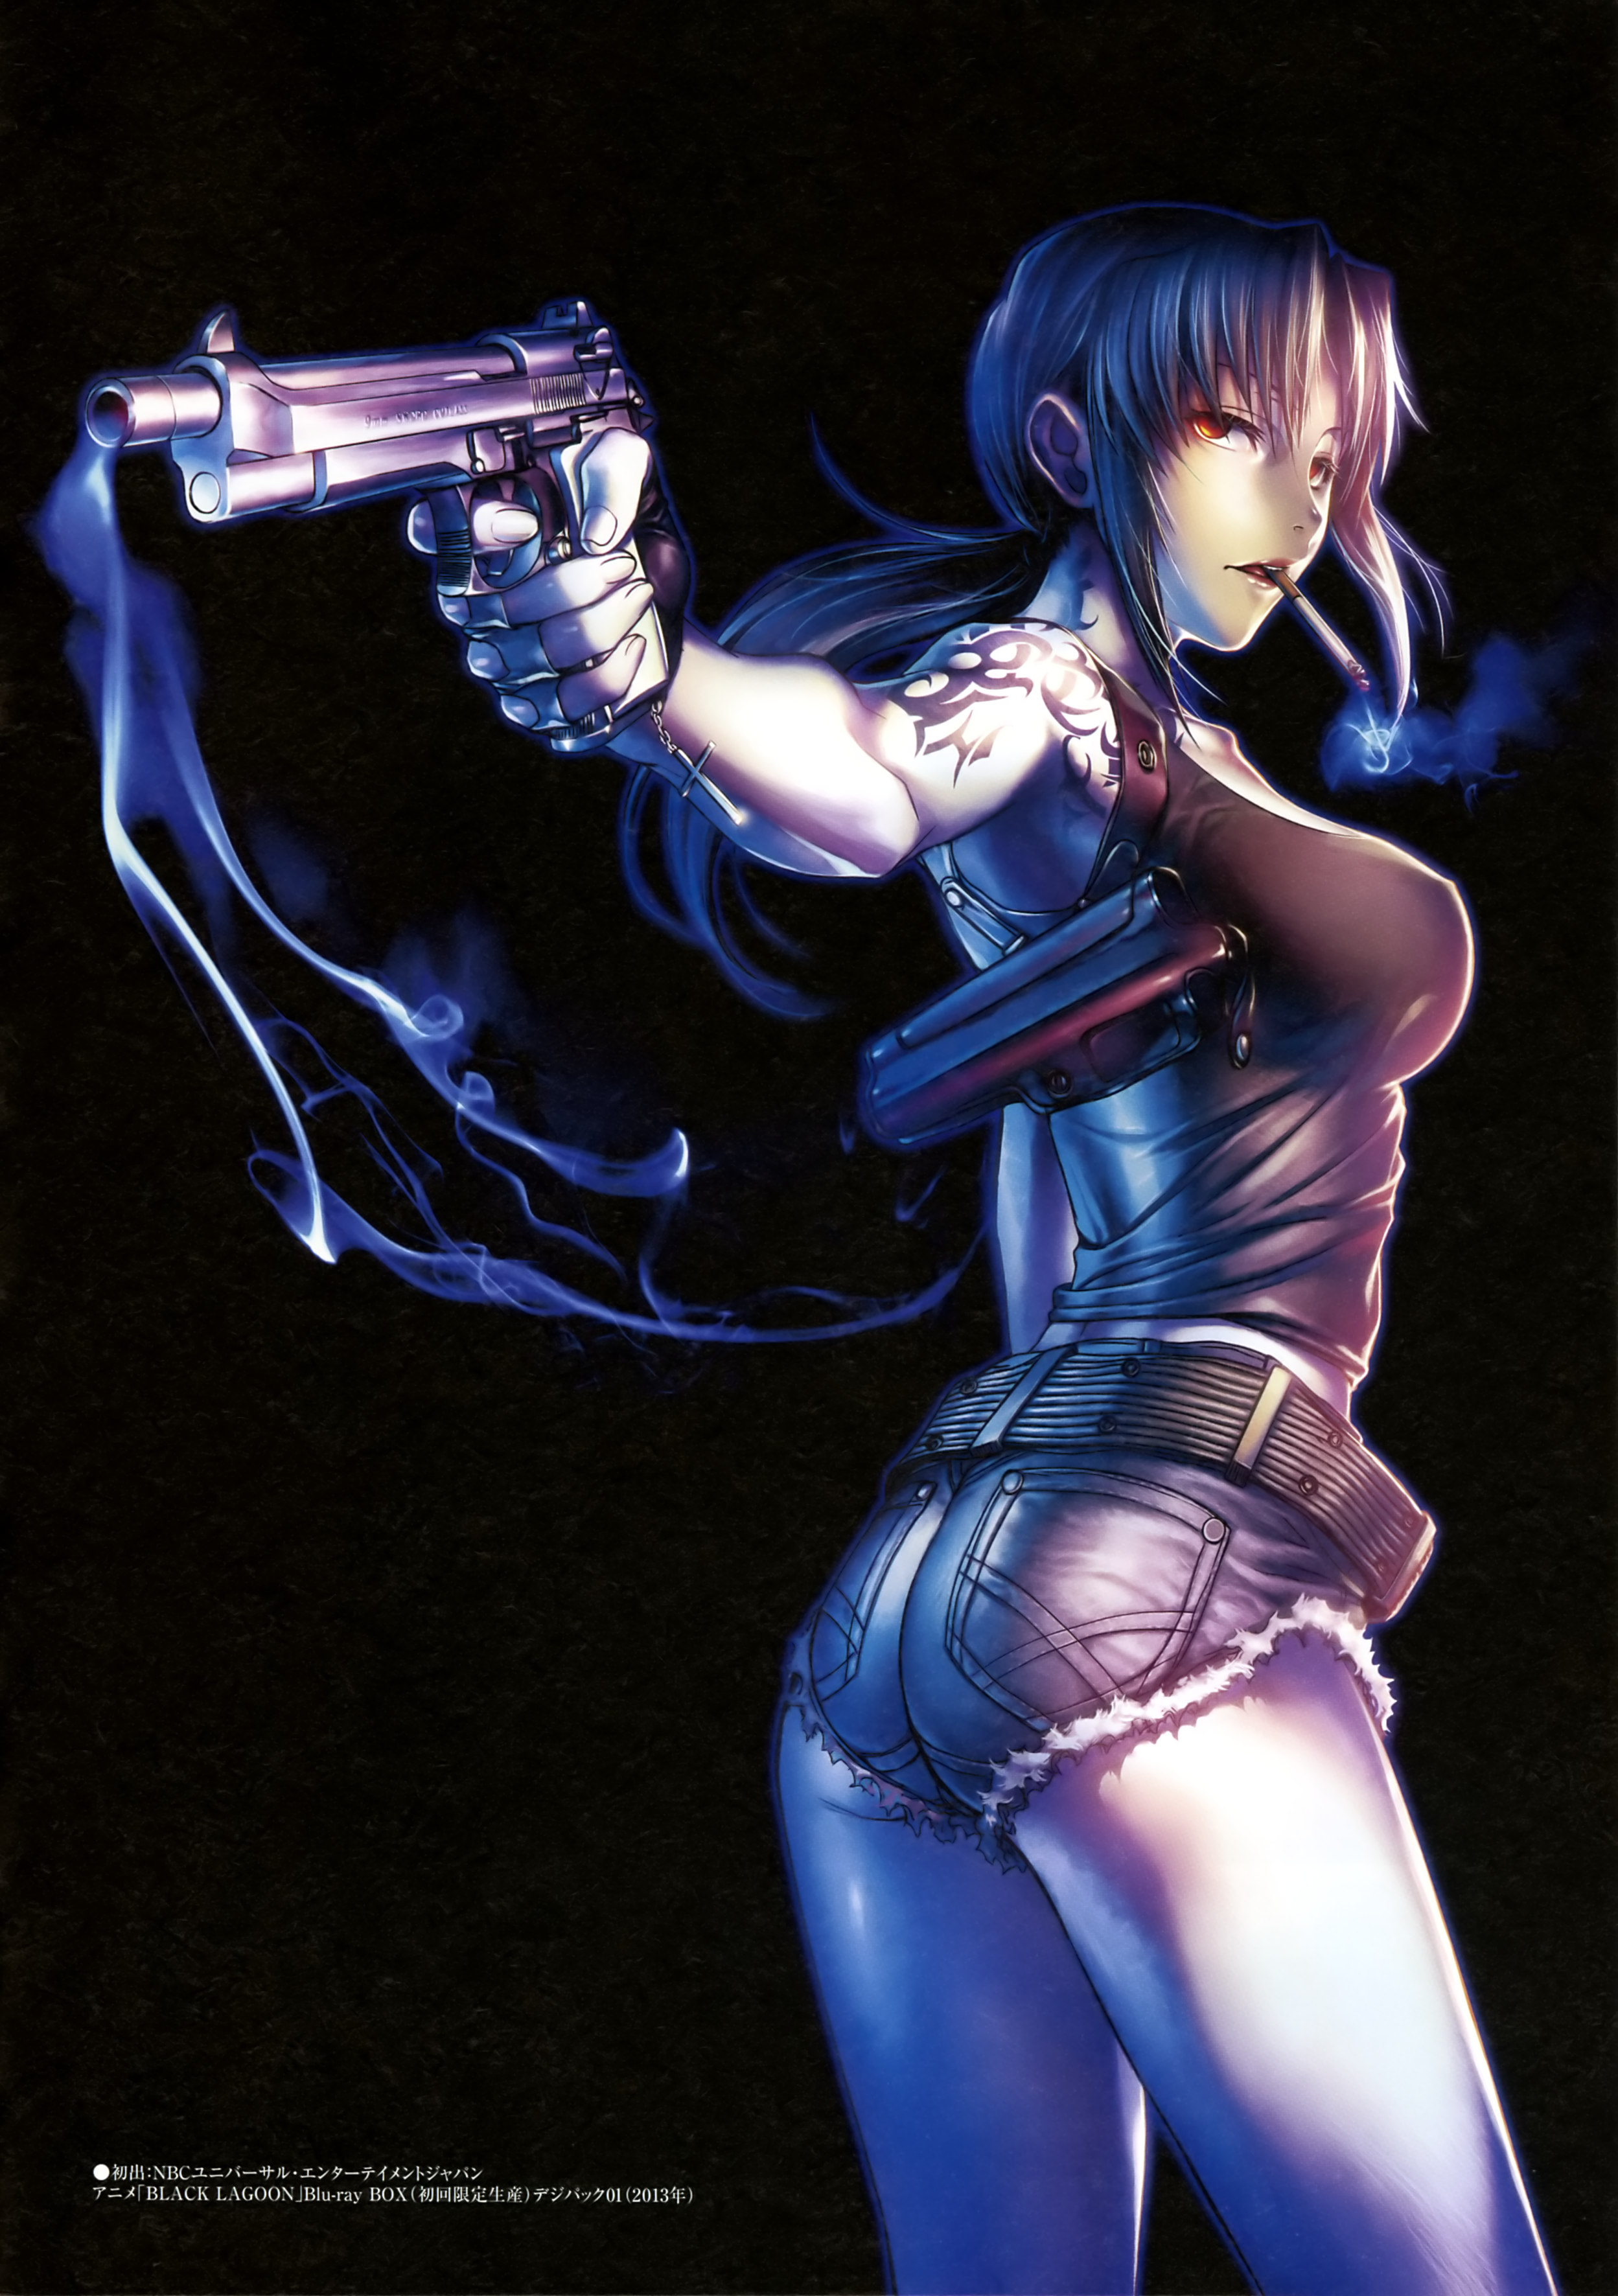 Characters: Mercenaries C6683c865f54683174795a552738e98e_by_keskewolf-dalt7cx